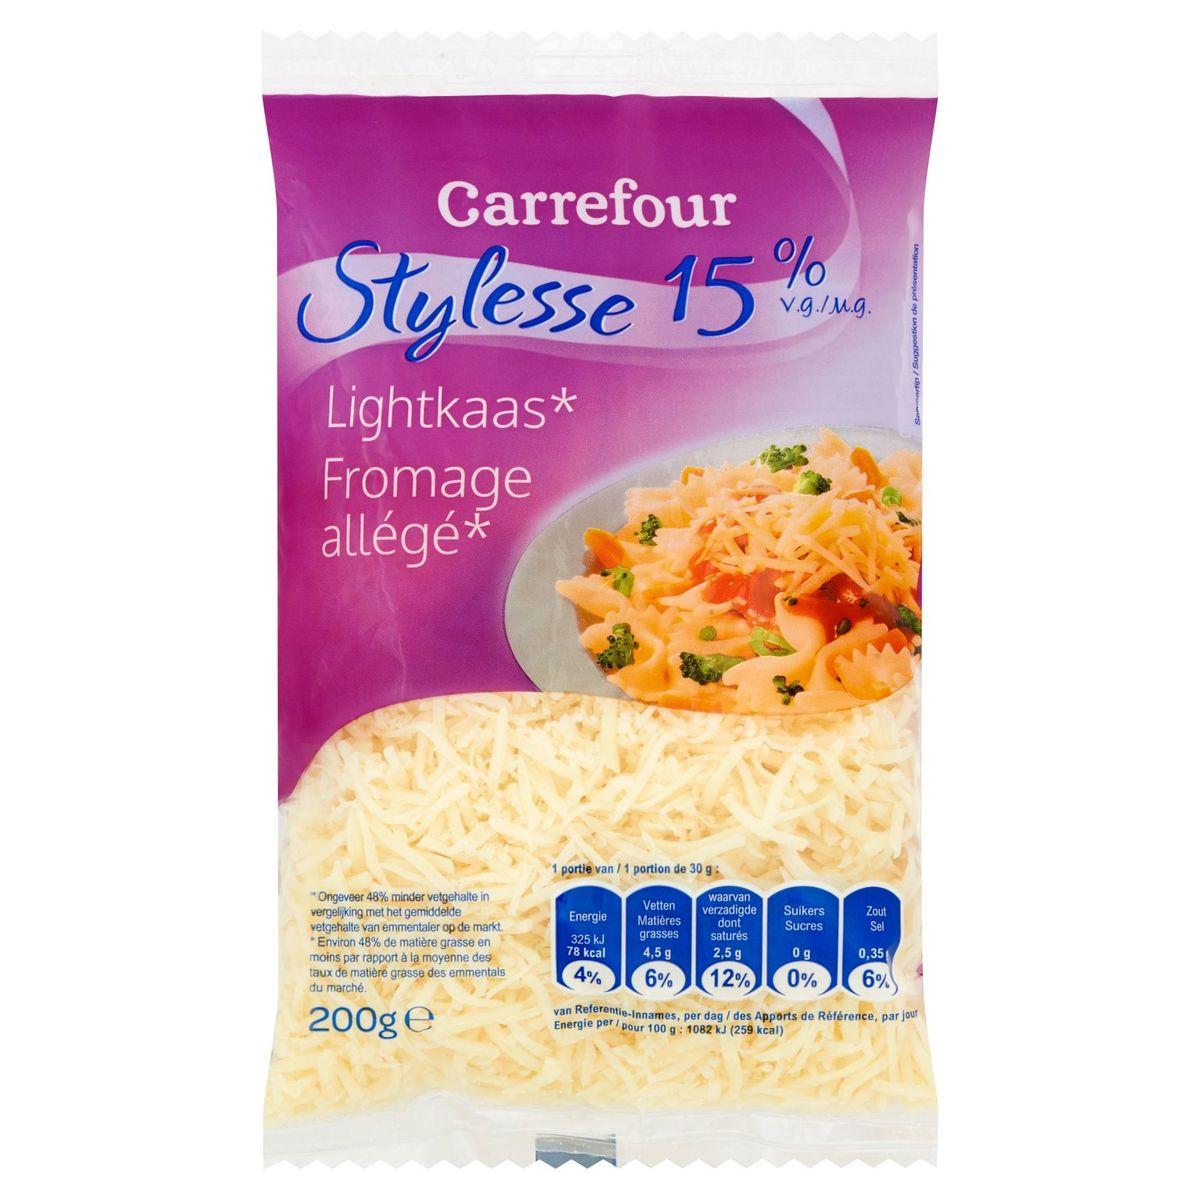 Carrefour Stylesse 15% M.G. Fromage Allégé 200 g